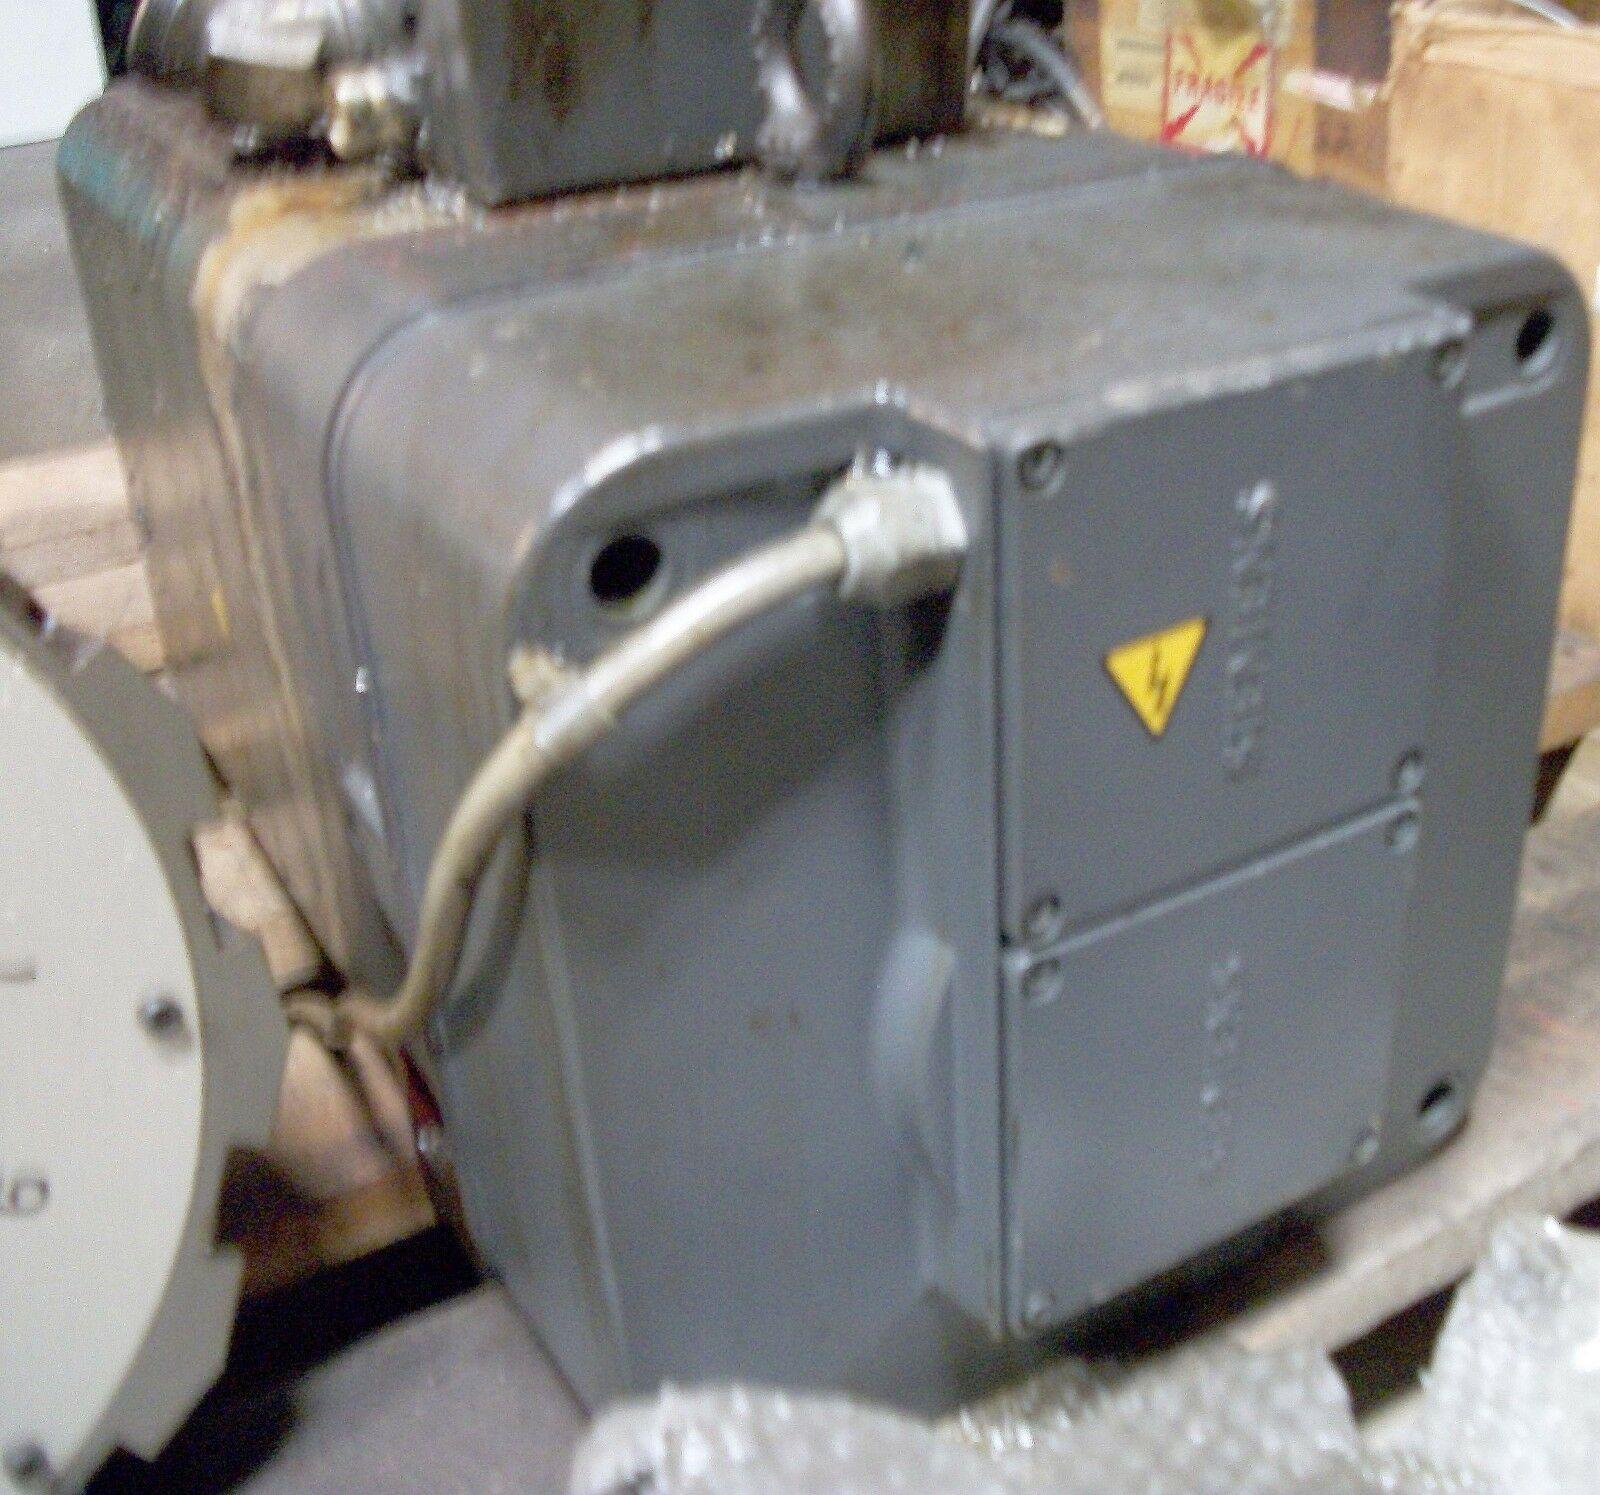 Siemens Spindle Motor 1PH6161-4NF00-Z CMI Part# 1-606-3203